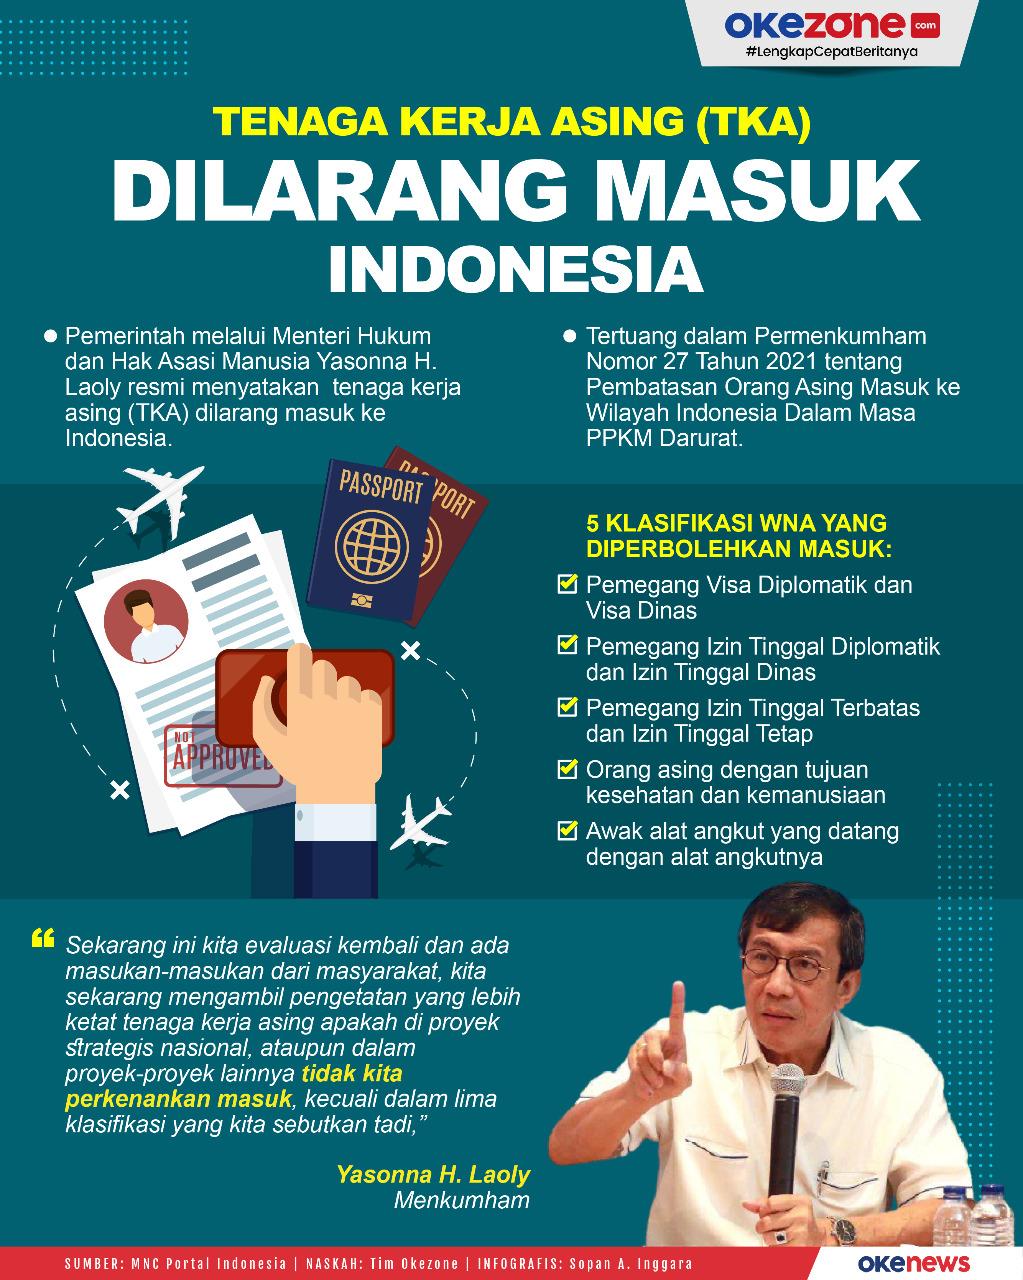 Tenaga Kerja Asing (TKA) Dilarang Masuk Indonesia -